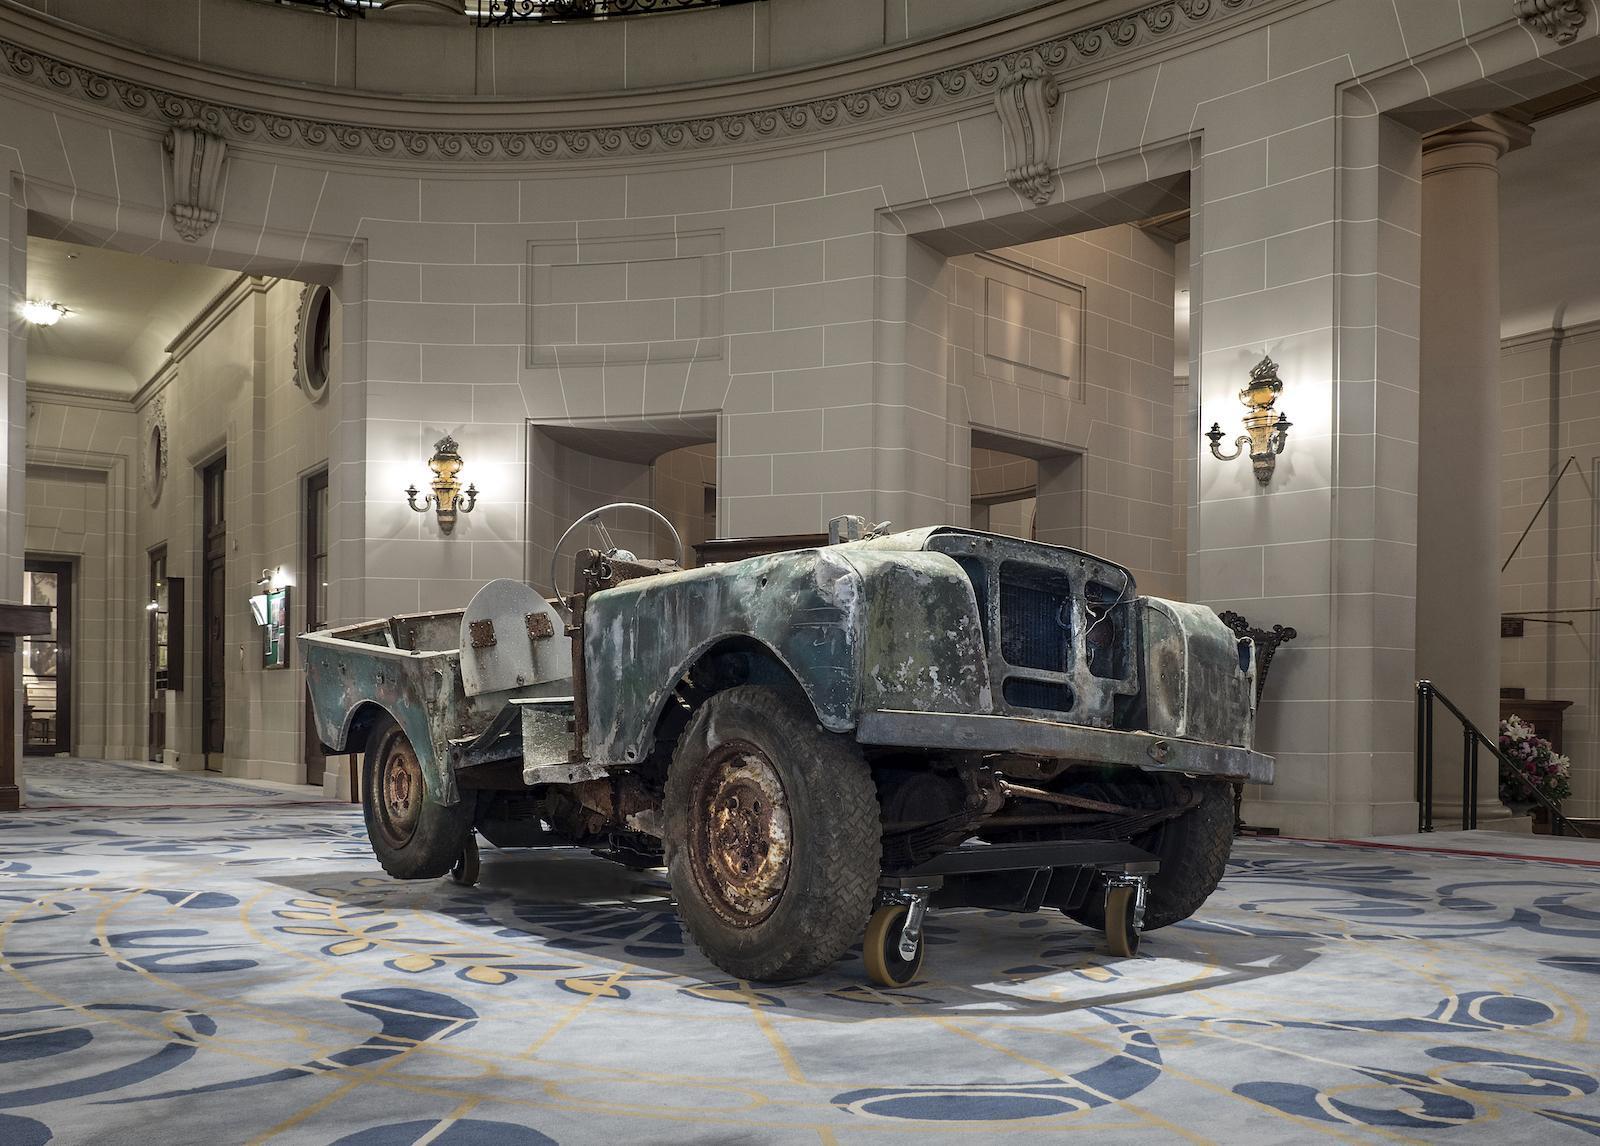 Land-Rover-chasis-860001-9.jpg